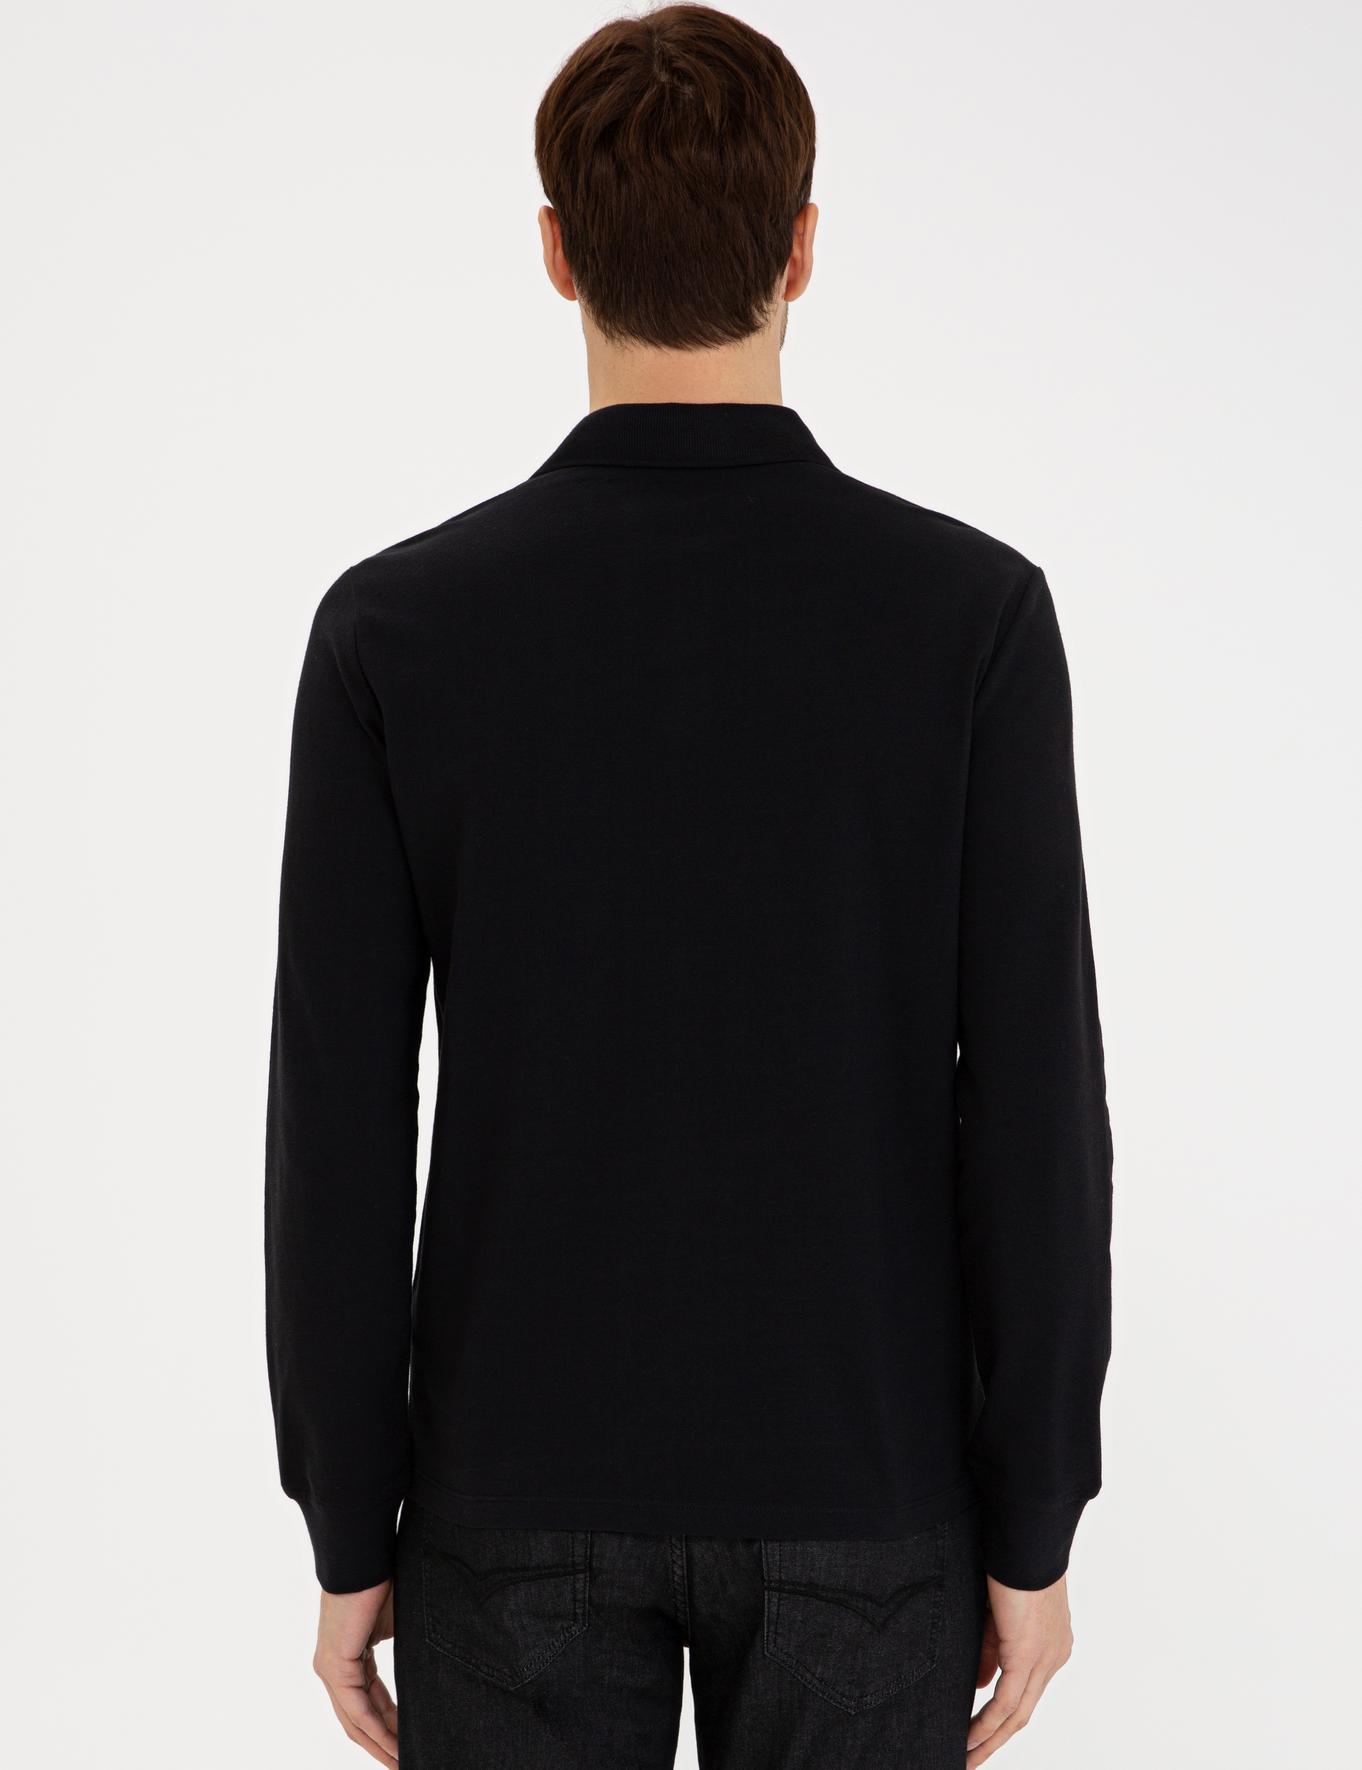 Siyah Slim Fit Sweatshirt - 50240038004